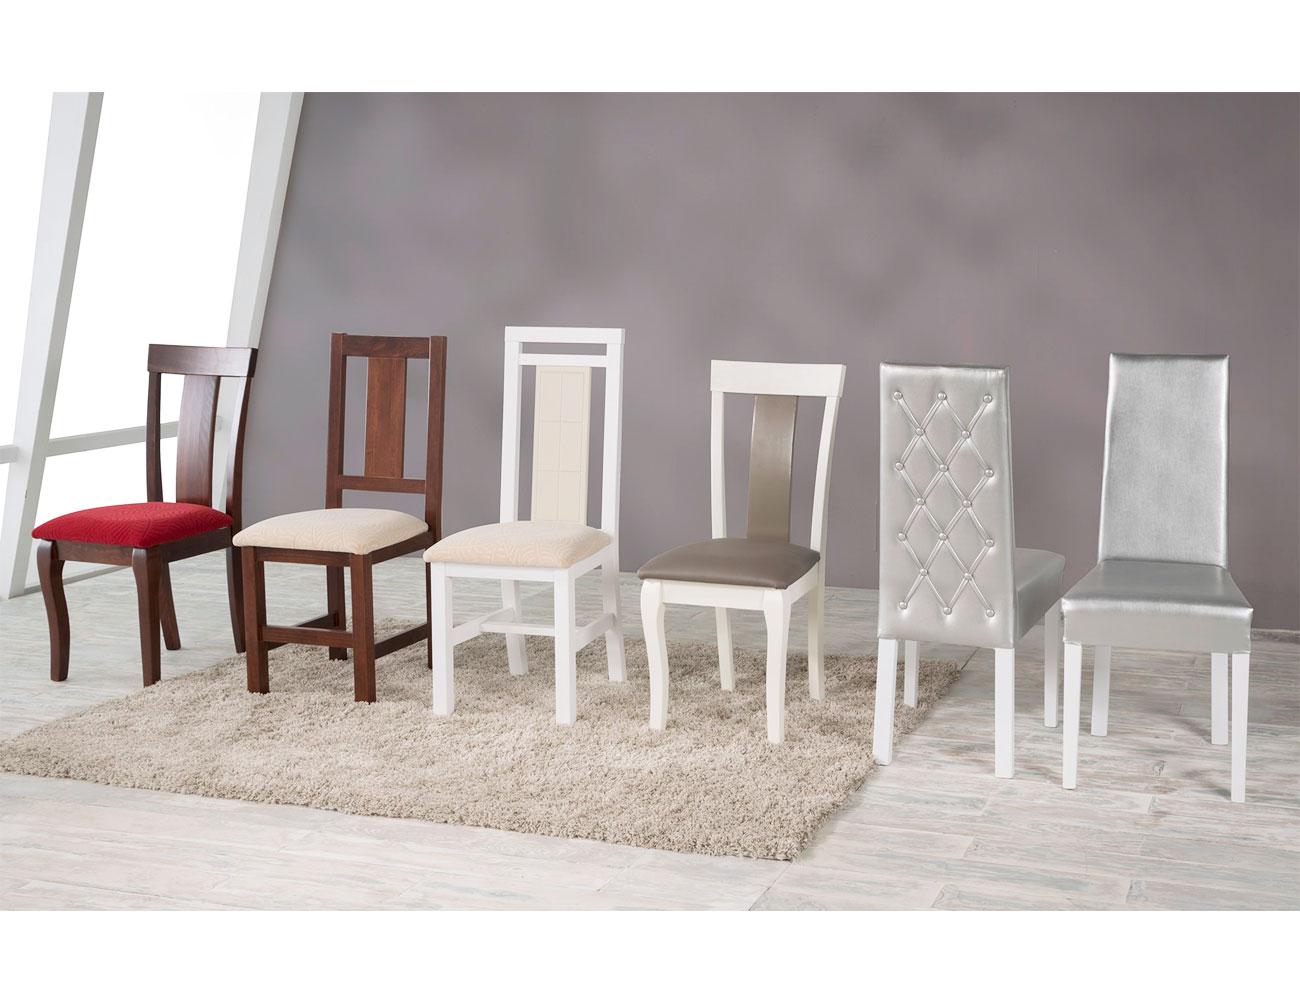 Modelos sillas3